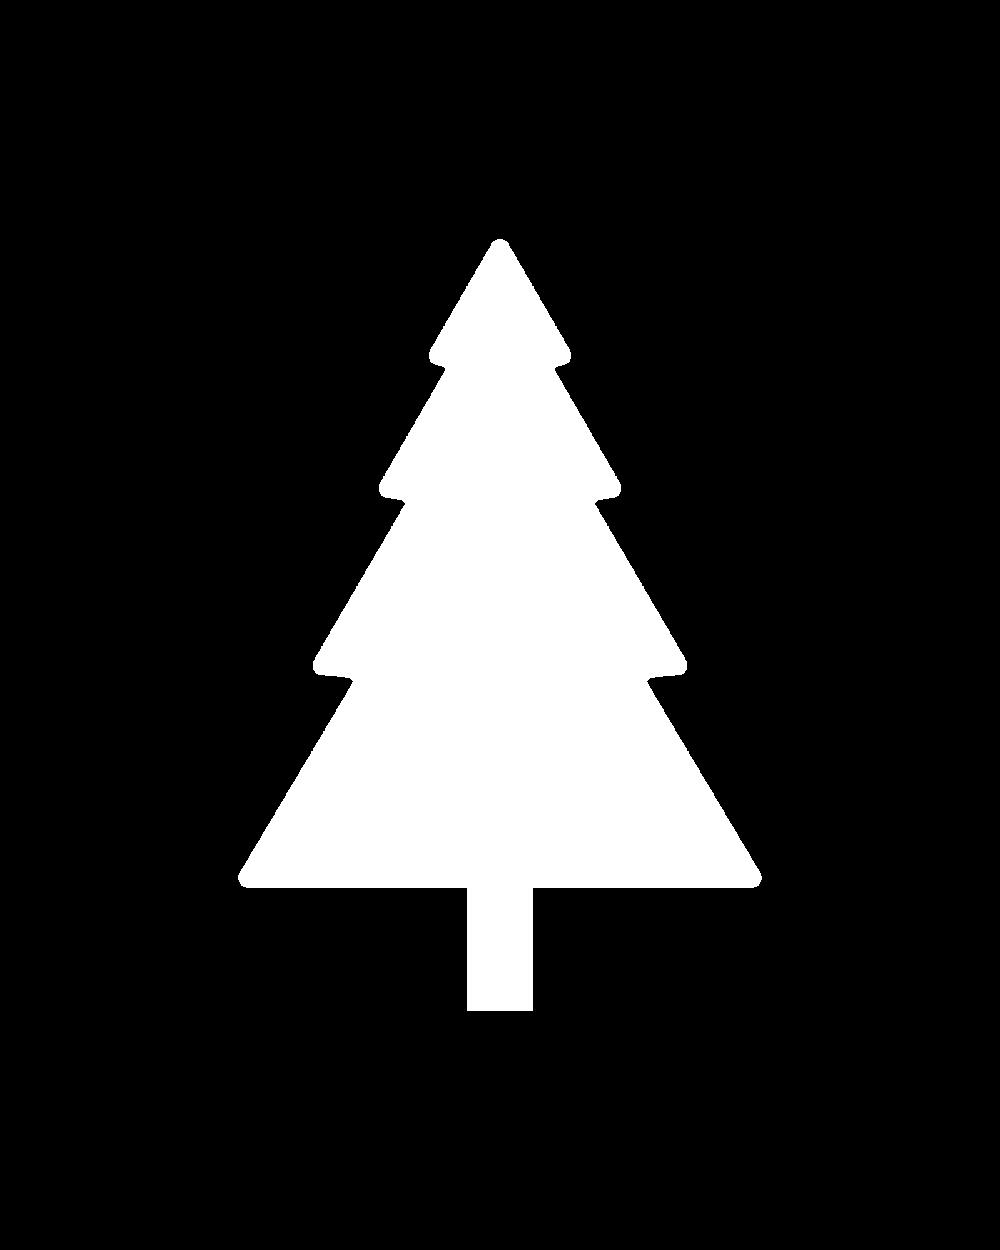 Tree Service     The Urban Arborist    415.676.1949    Lic#  994610